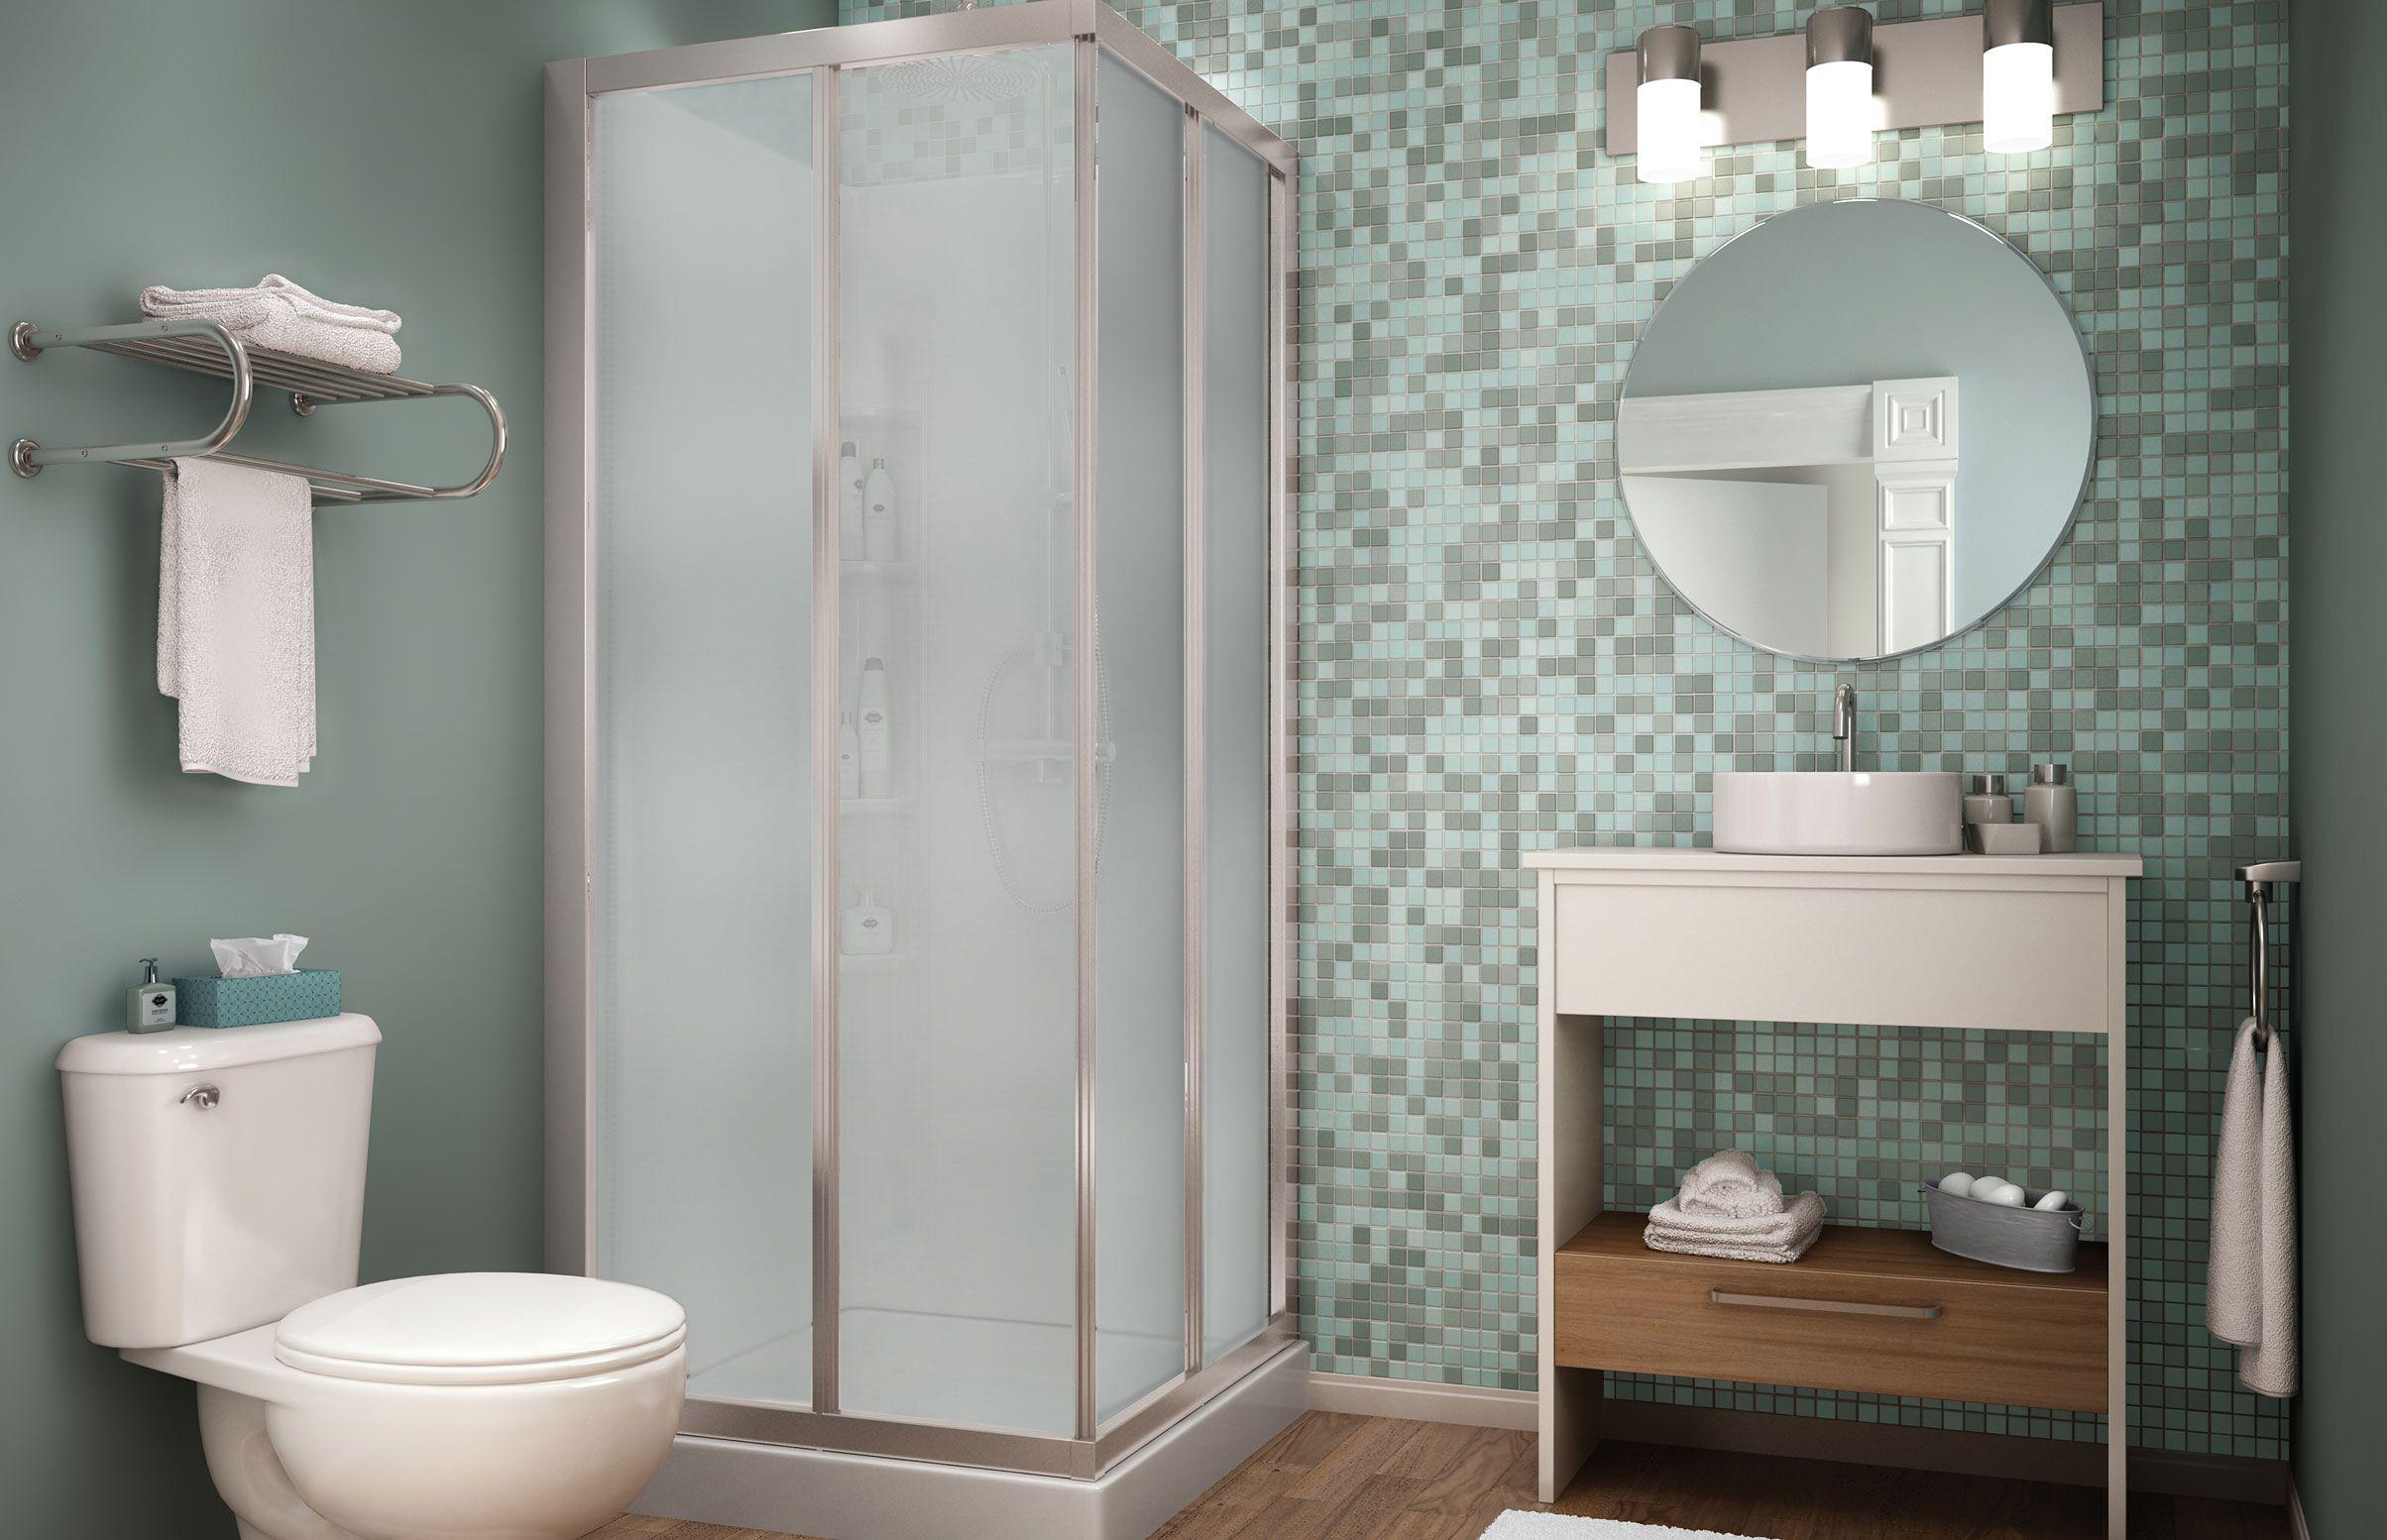 Mirolin Dahlia Iii Square Corner Shower At 32 X 32 It S